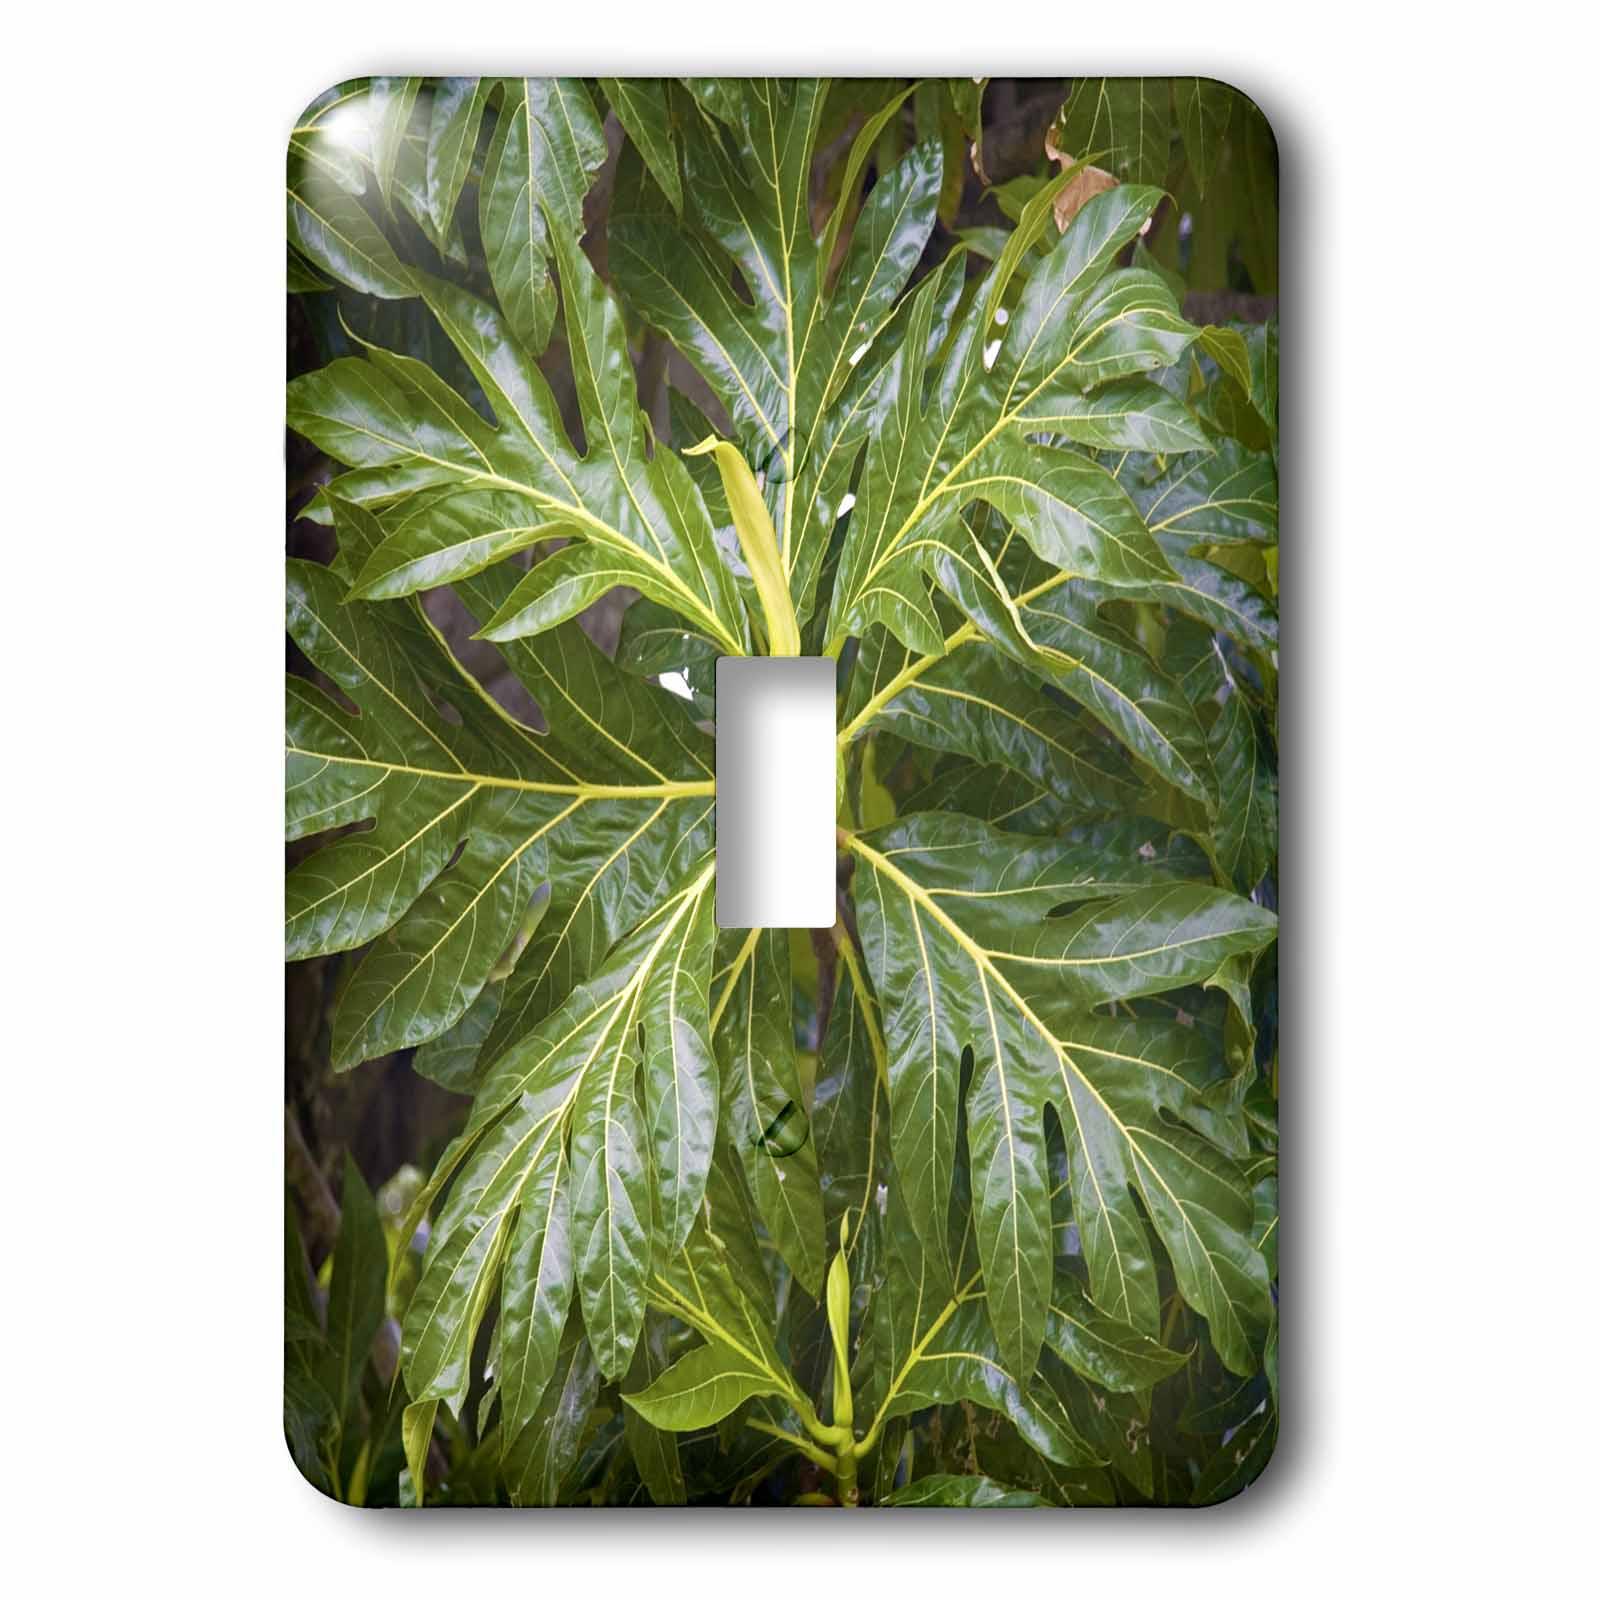 3dRose Breadfruit tree, Moorea, French Polynesia - OC13 DPB0078 - Douglas Peebles, 2 Plug Outlet Cover